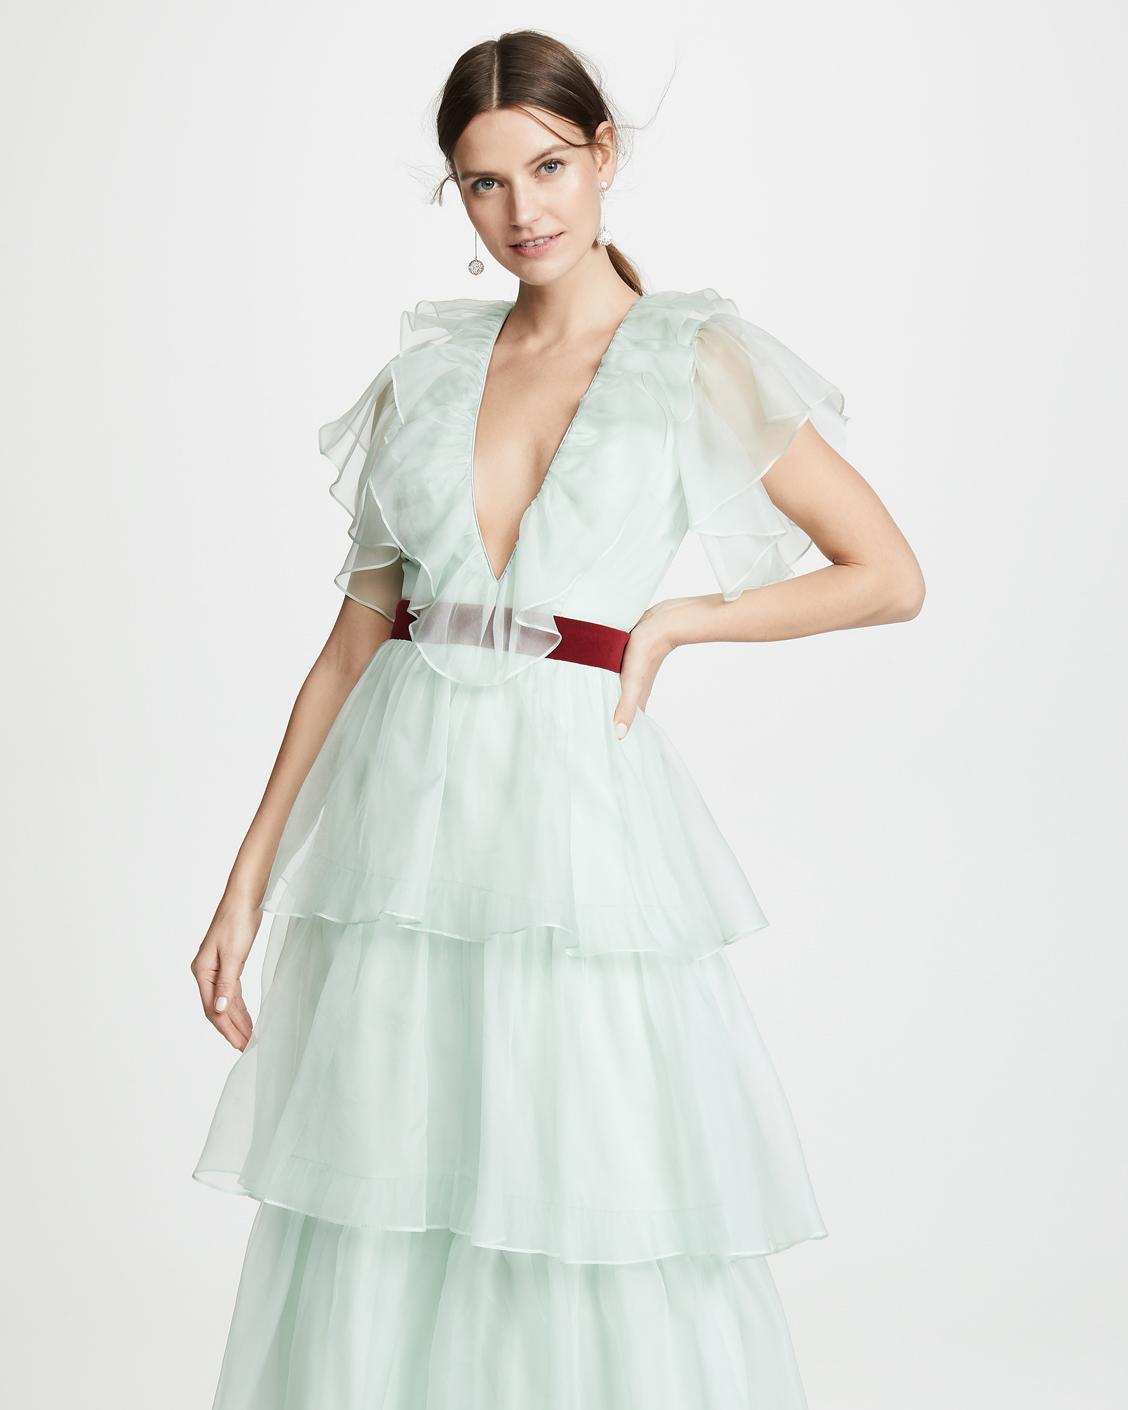 sea foam green plunge neck layered tulle dress